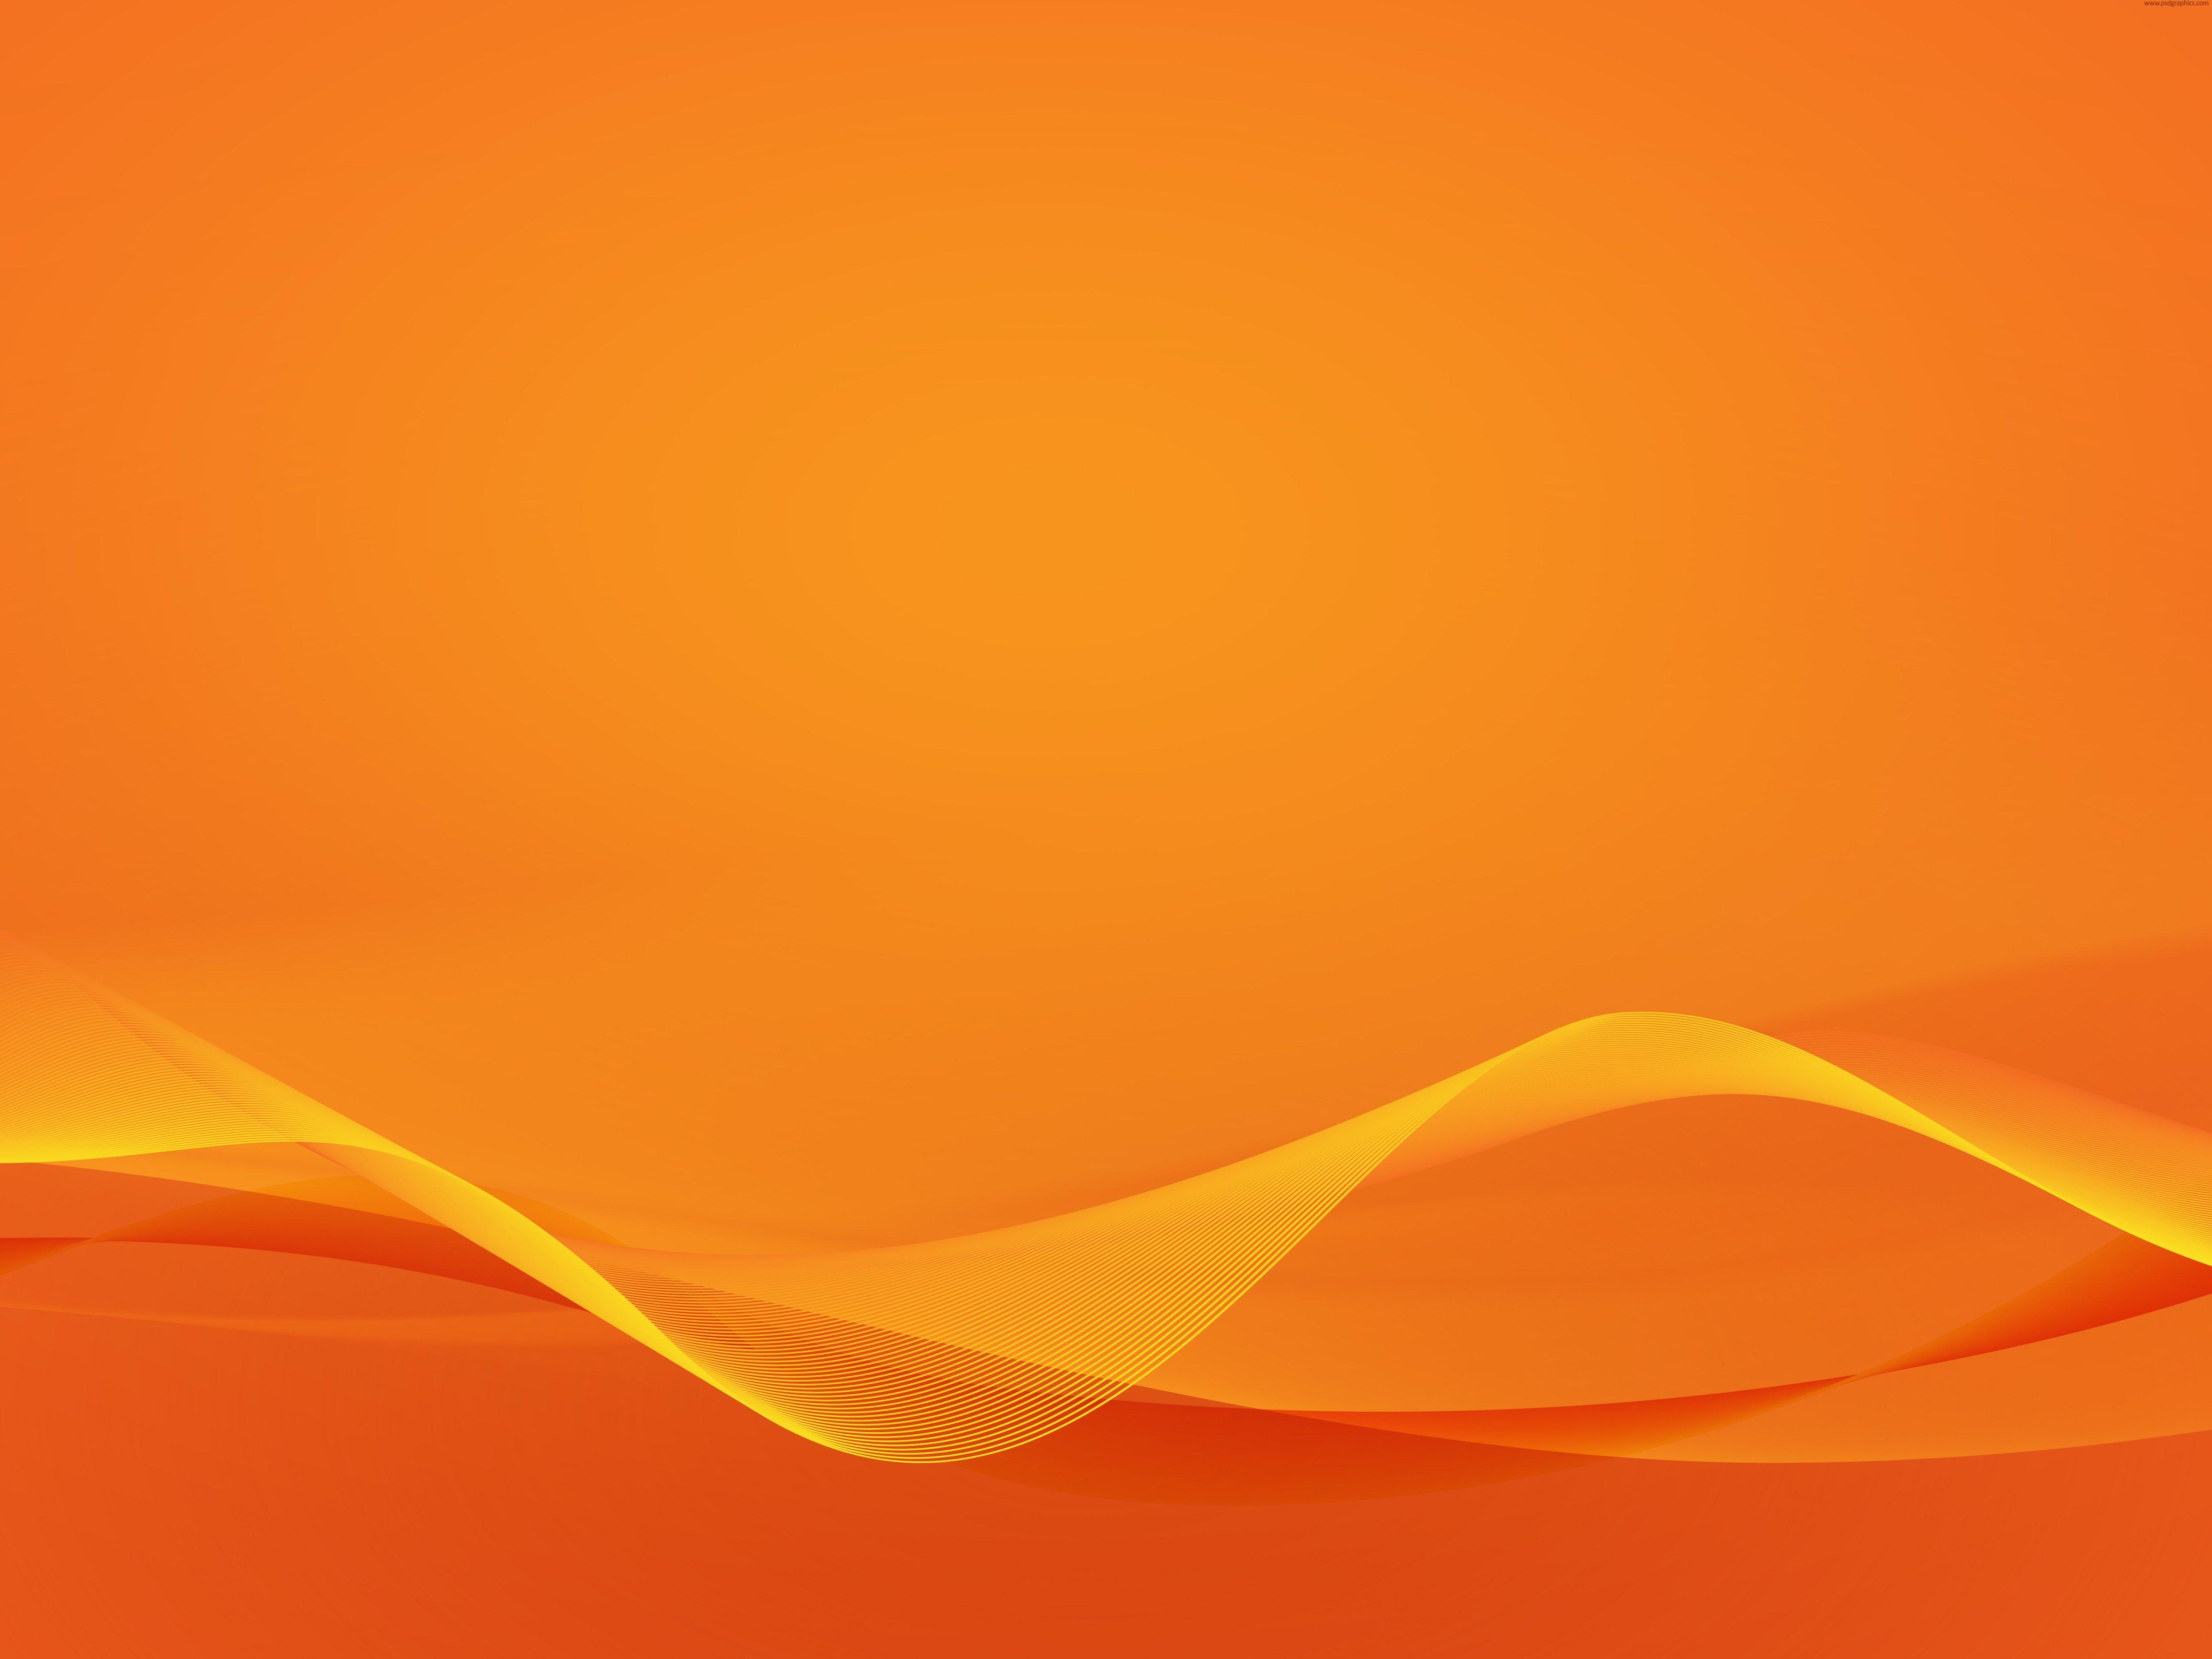 wavy-orange-background